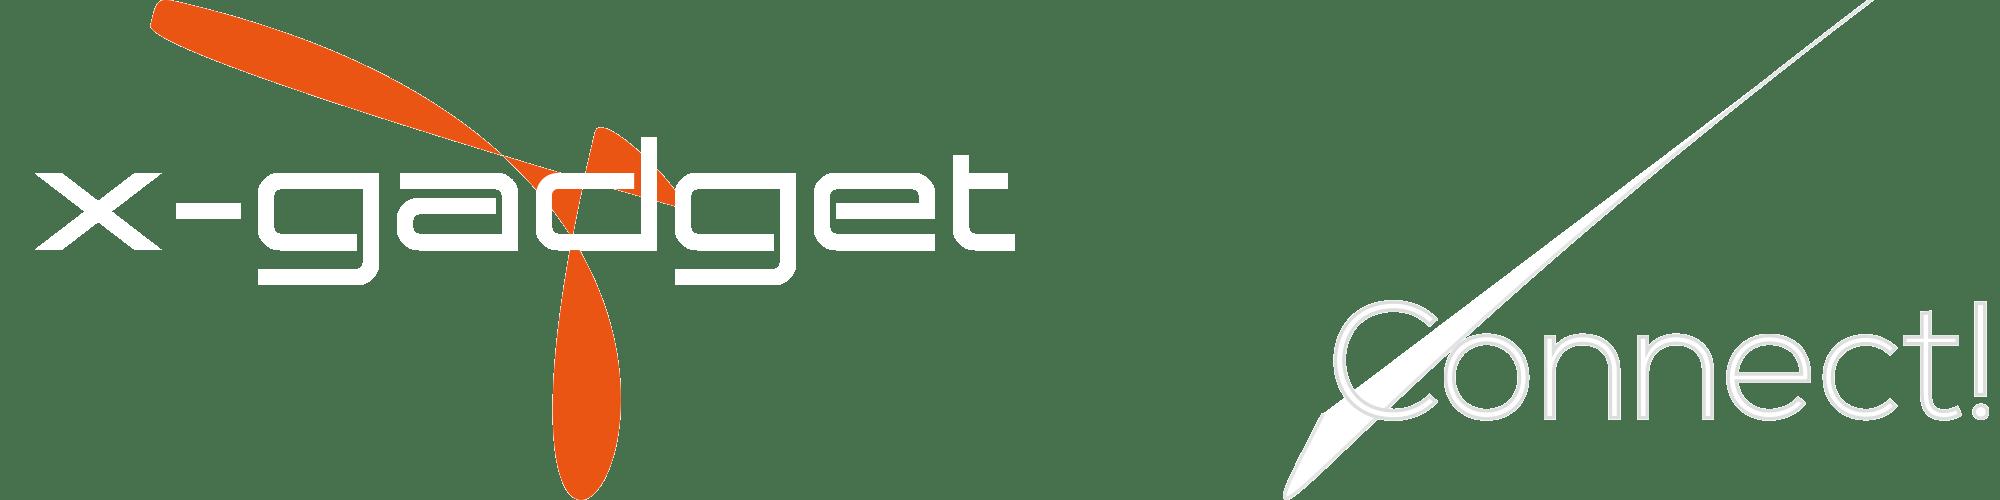 x-gadget